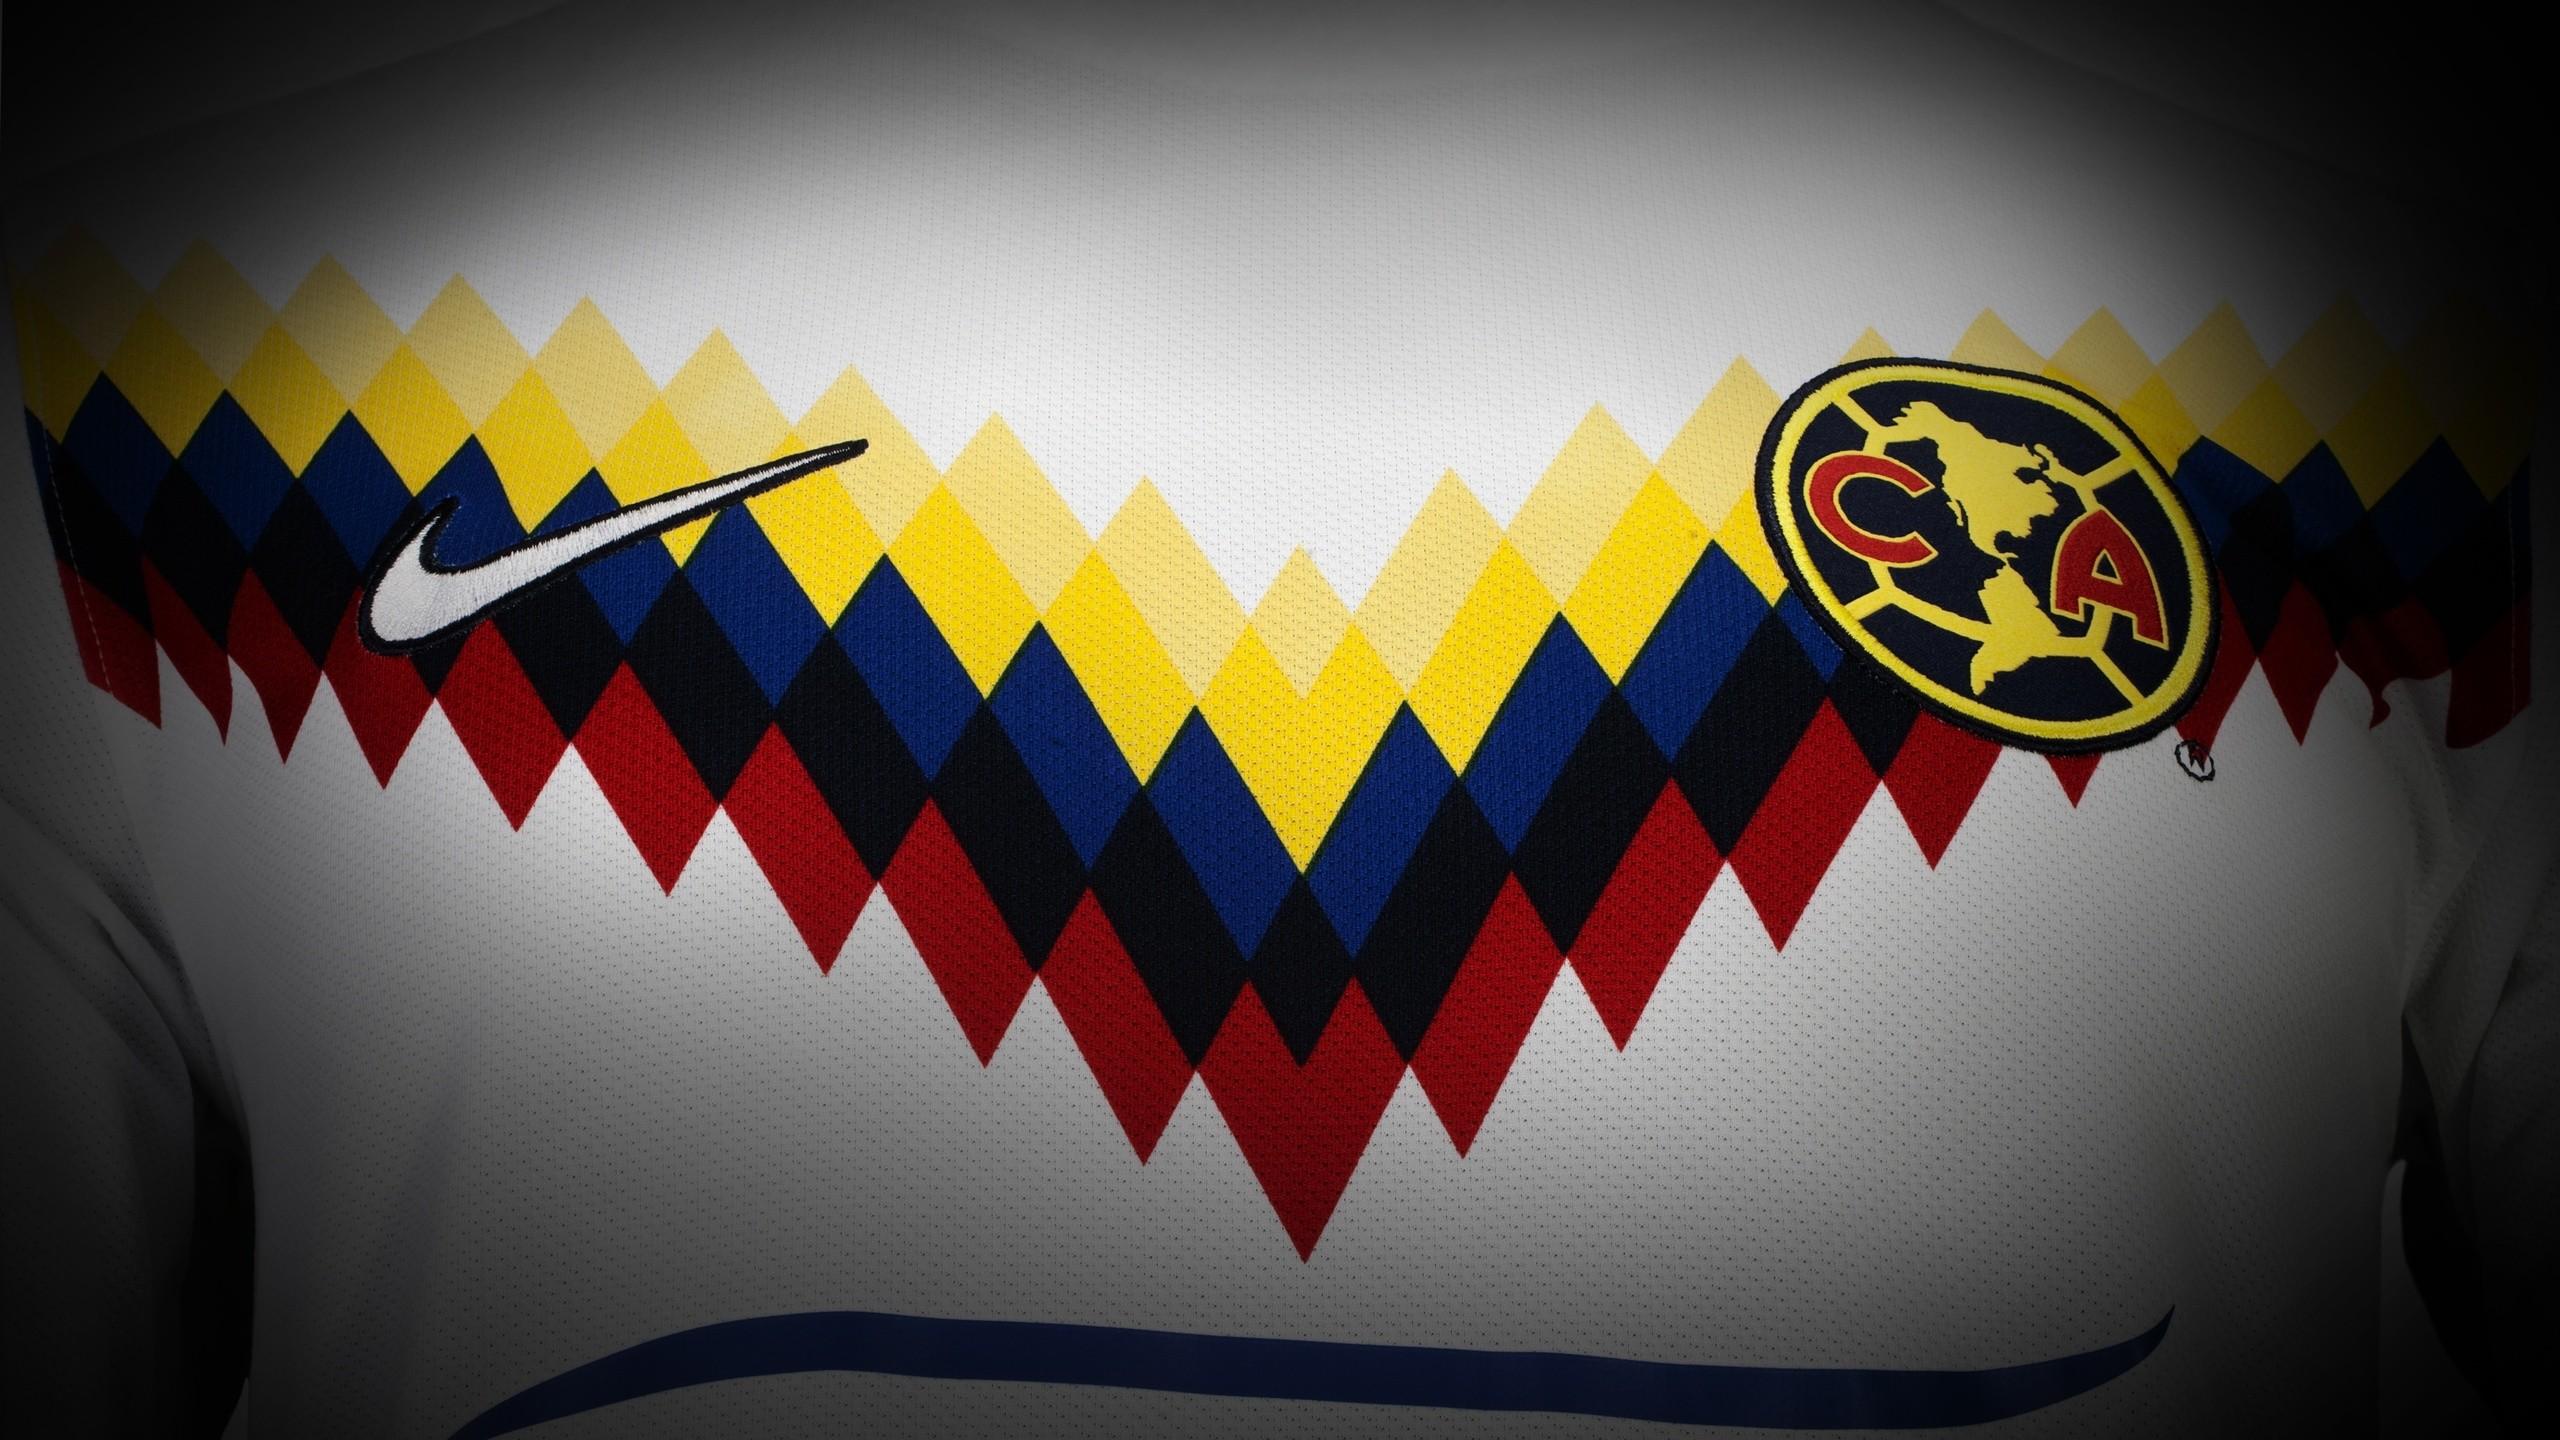 Football, Club America, Emblem, Football Club America Logo Clothing Emblem